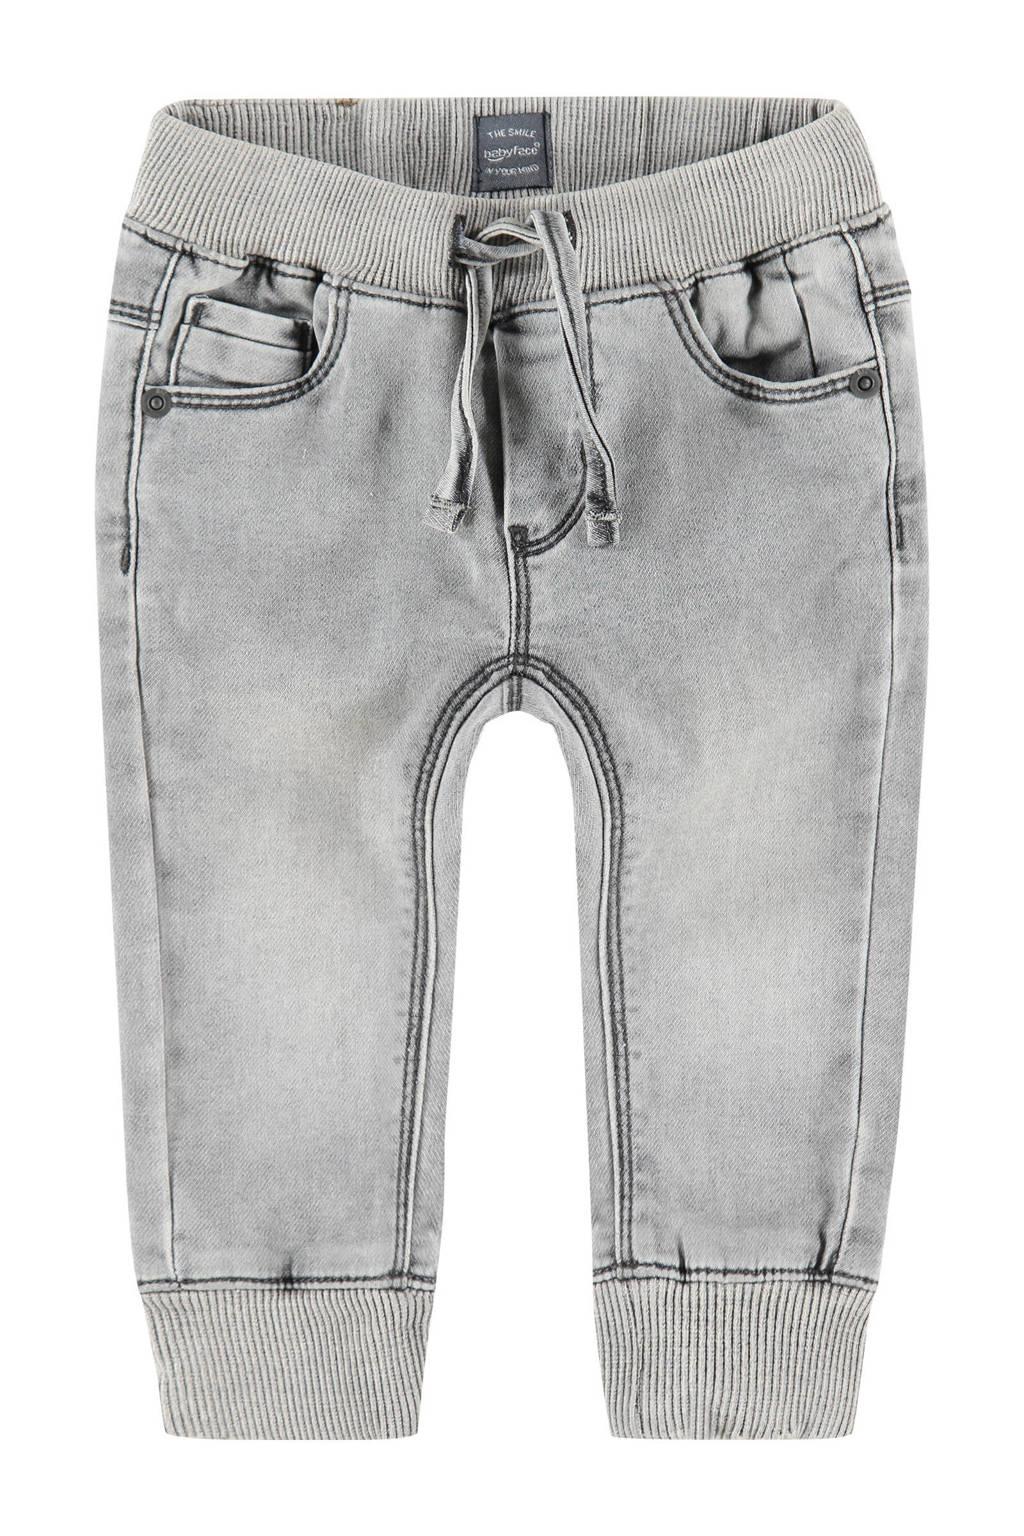 Babyface regular fit jeans grijs stonewashed, Grijs stonewashed